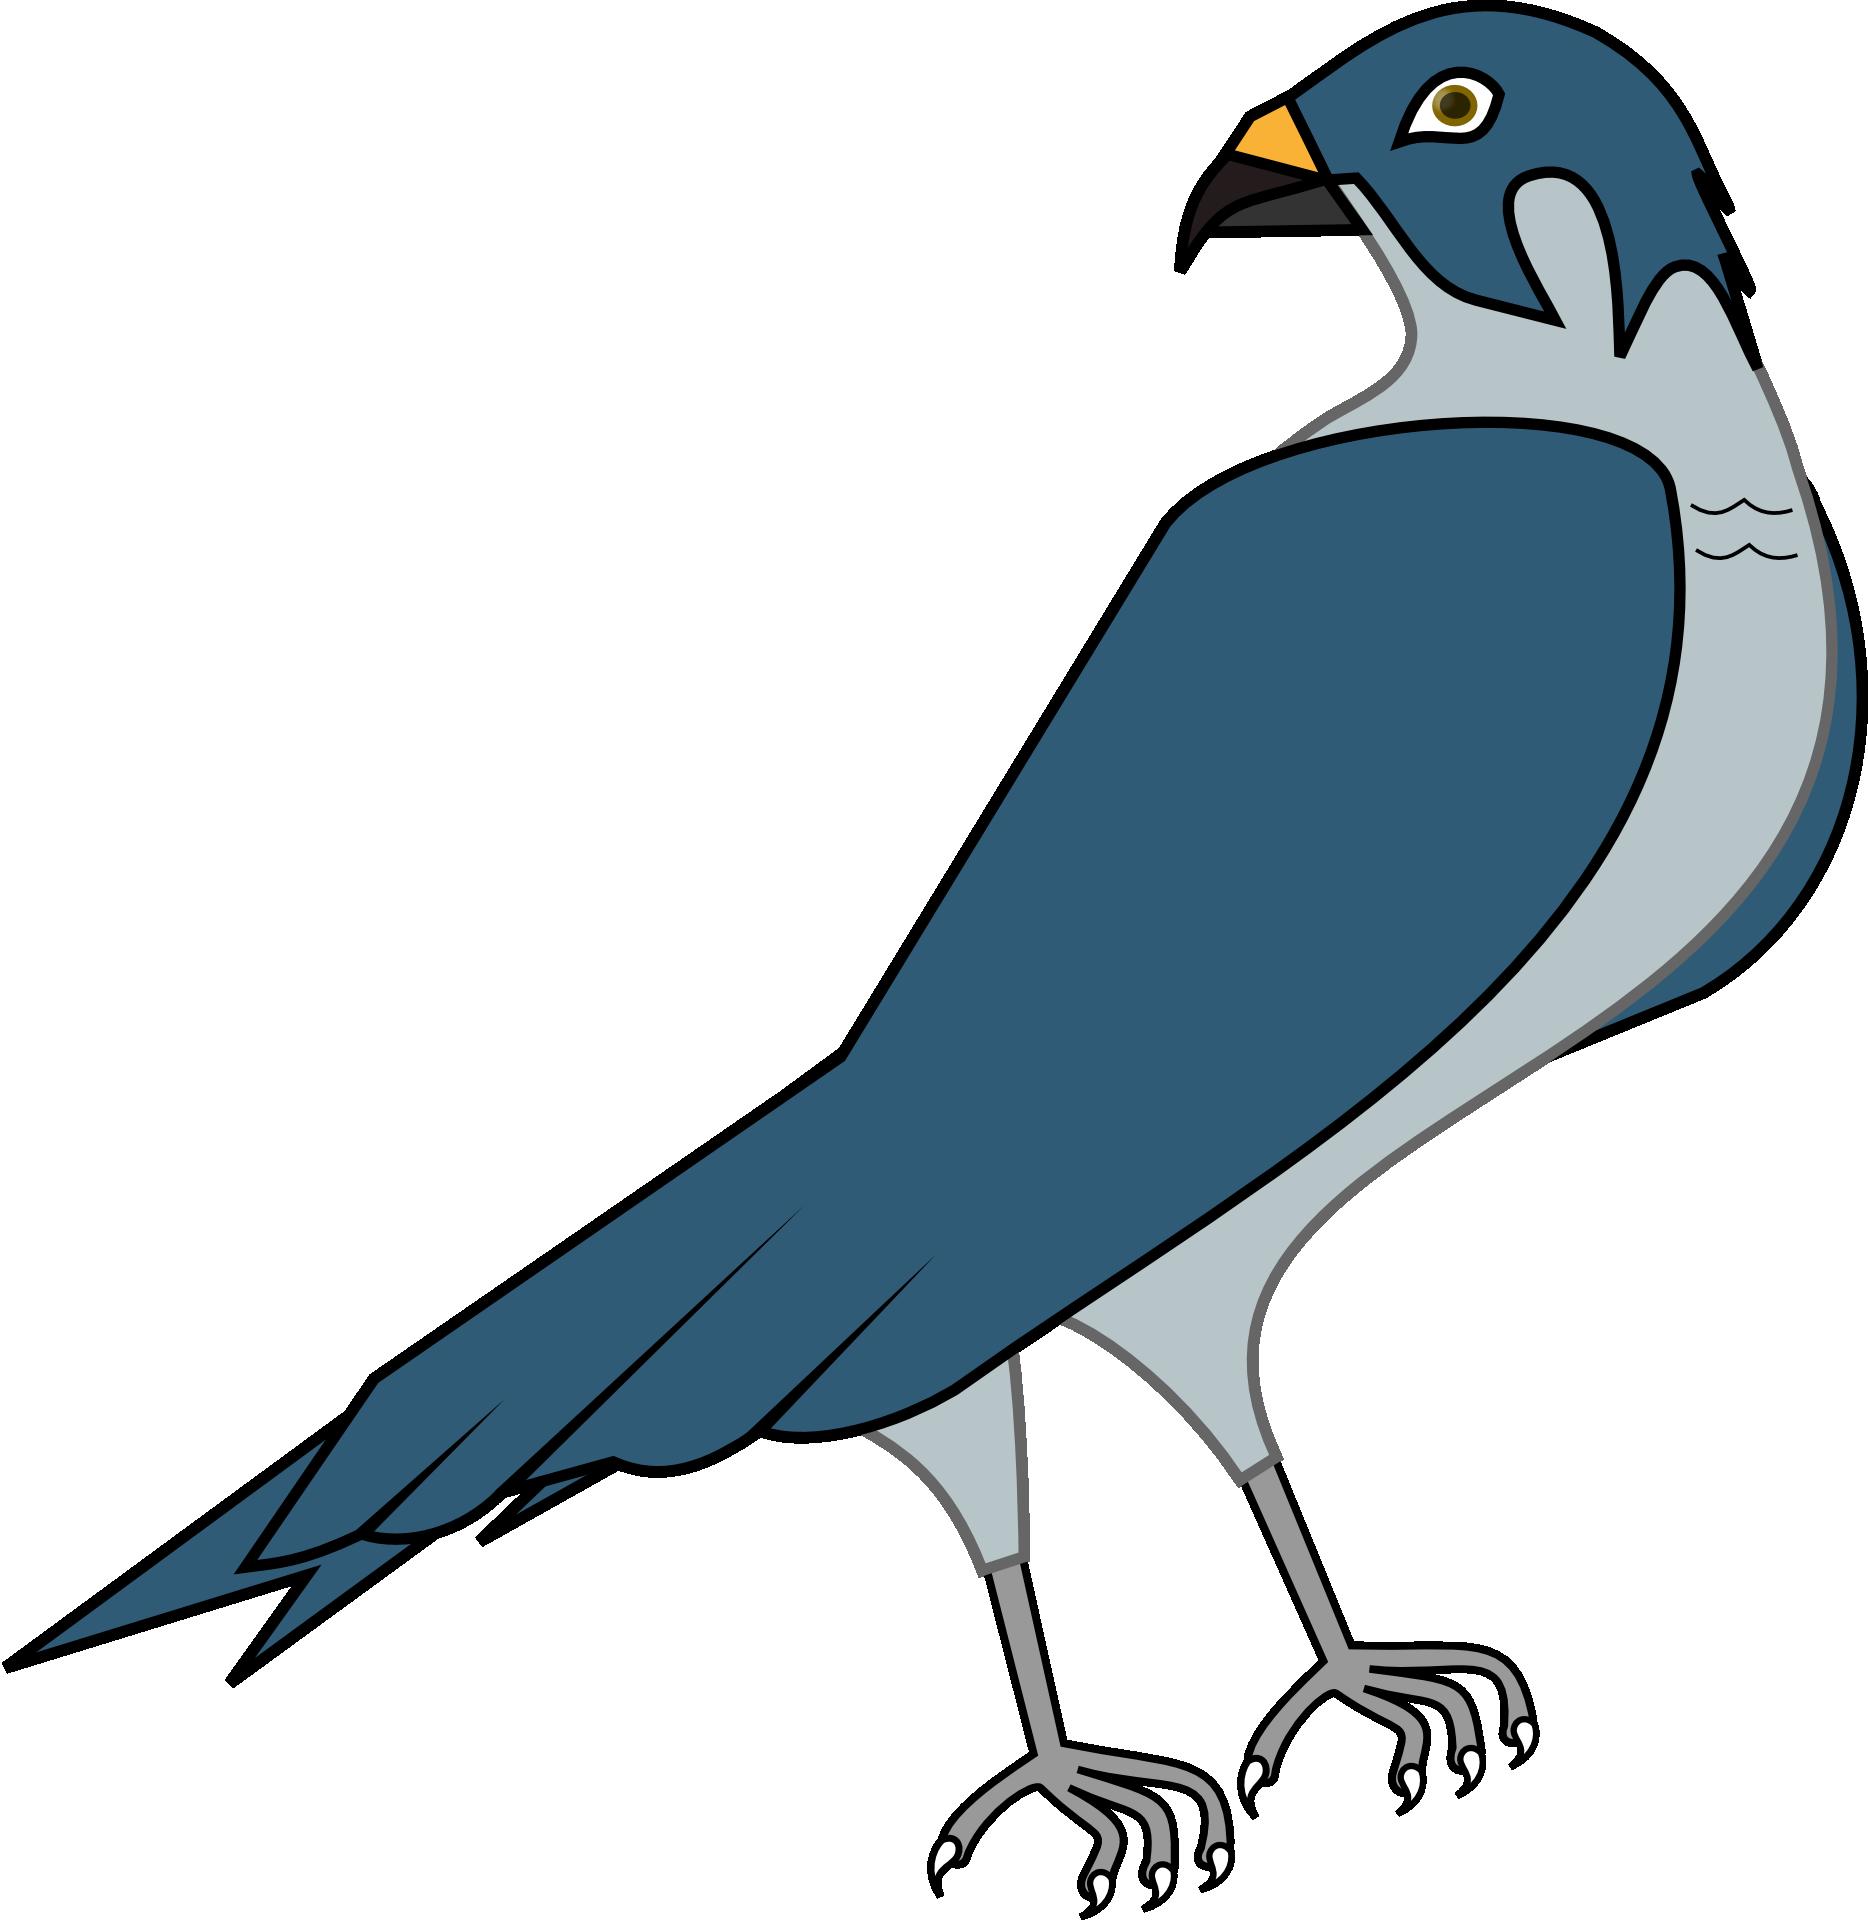 1868x1920 15 Vector Hawks Peregrine Falcon For Free Download On Mbtskoudsalg